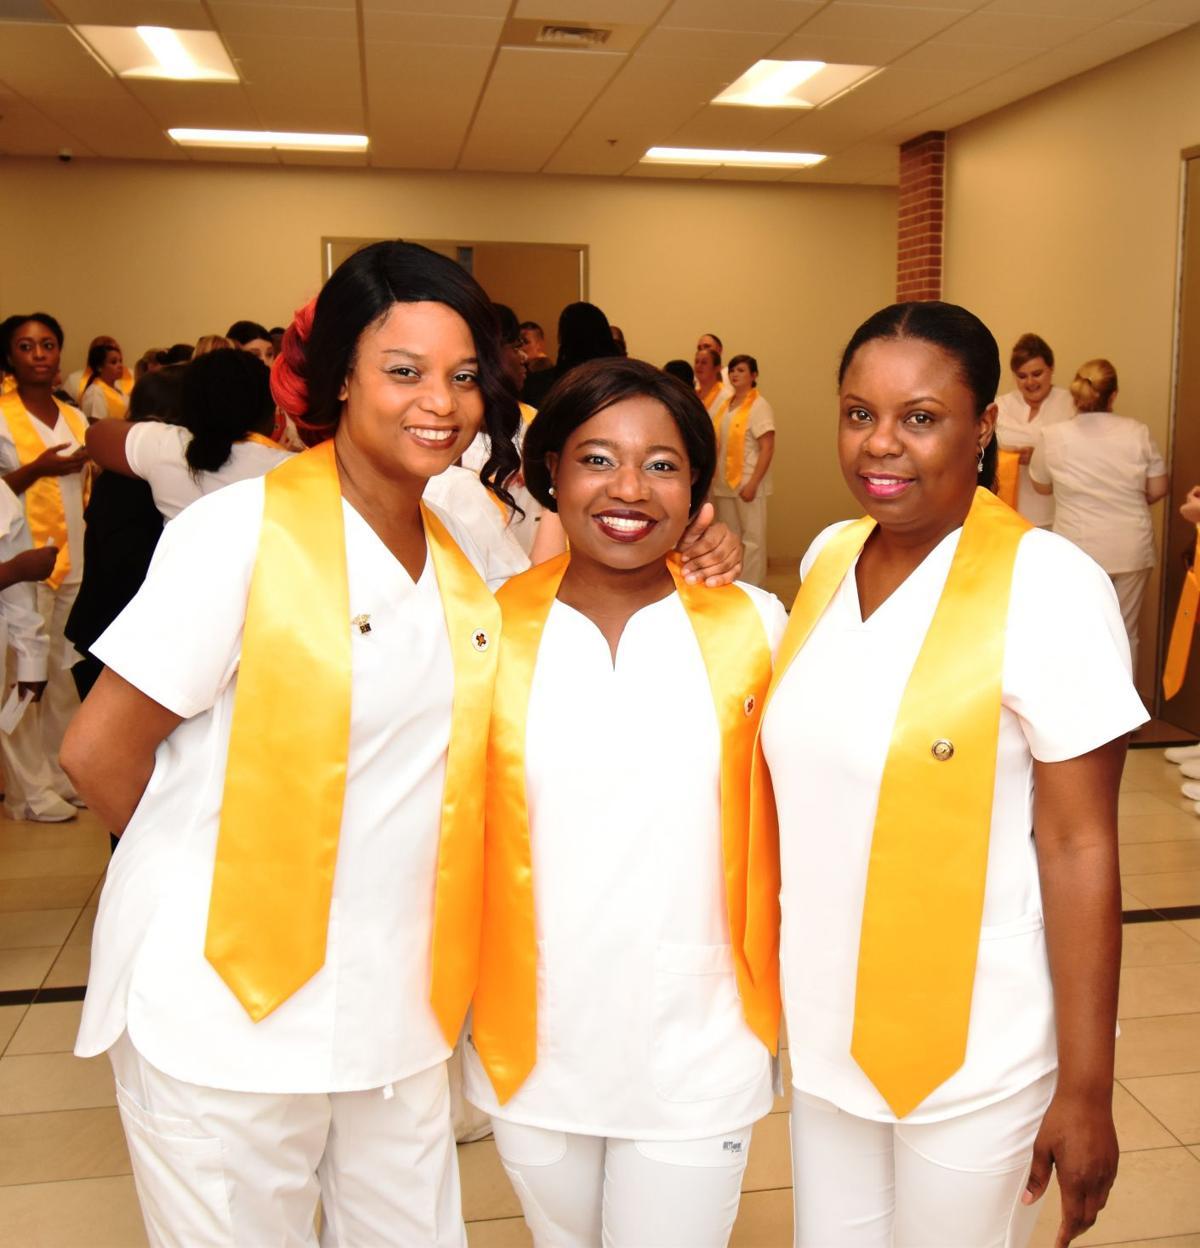 ASU - Darton College of Health Professions Nursing Pinning Ceremony - Dec. 6, 2018 -6.jpg